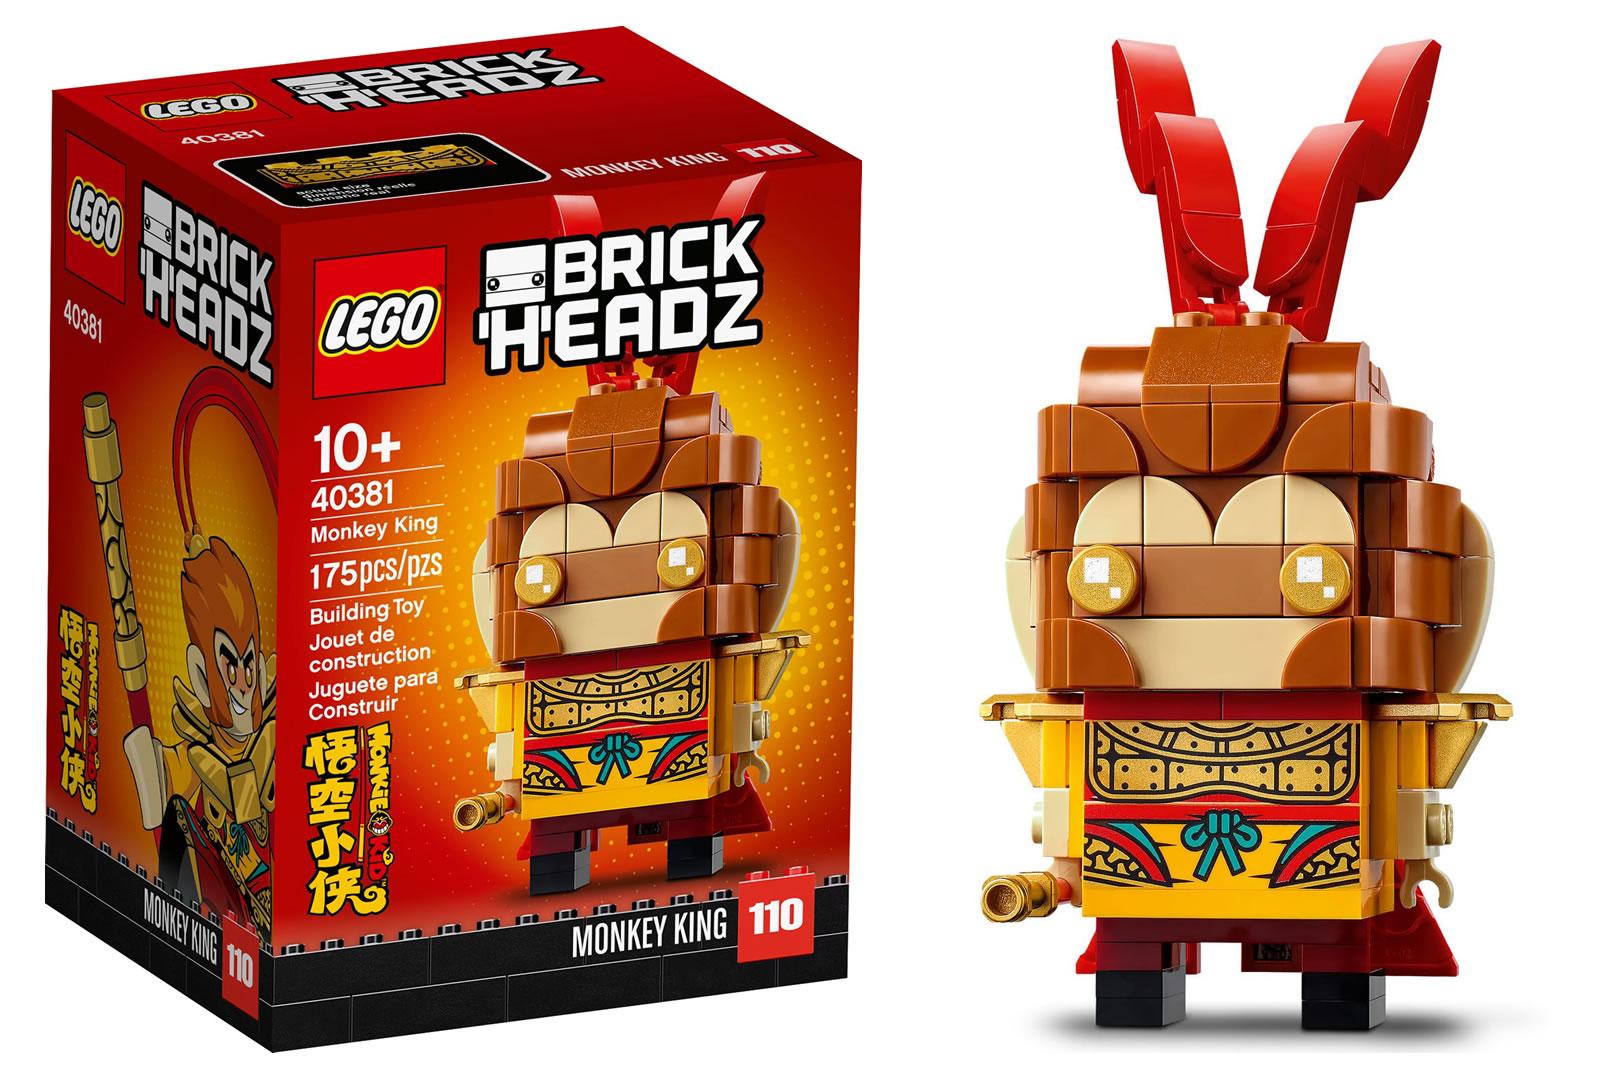 lego-40381-brickheadz-monkey-king-2020 zusammengebaut.com